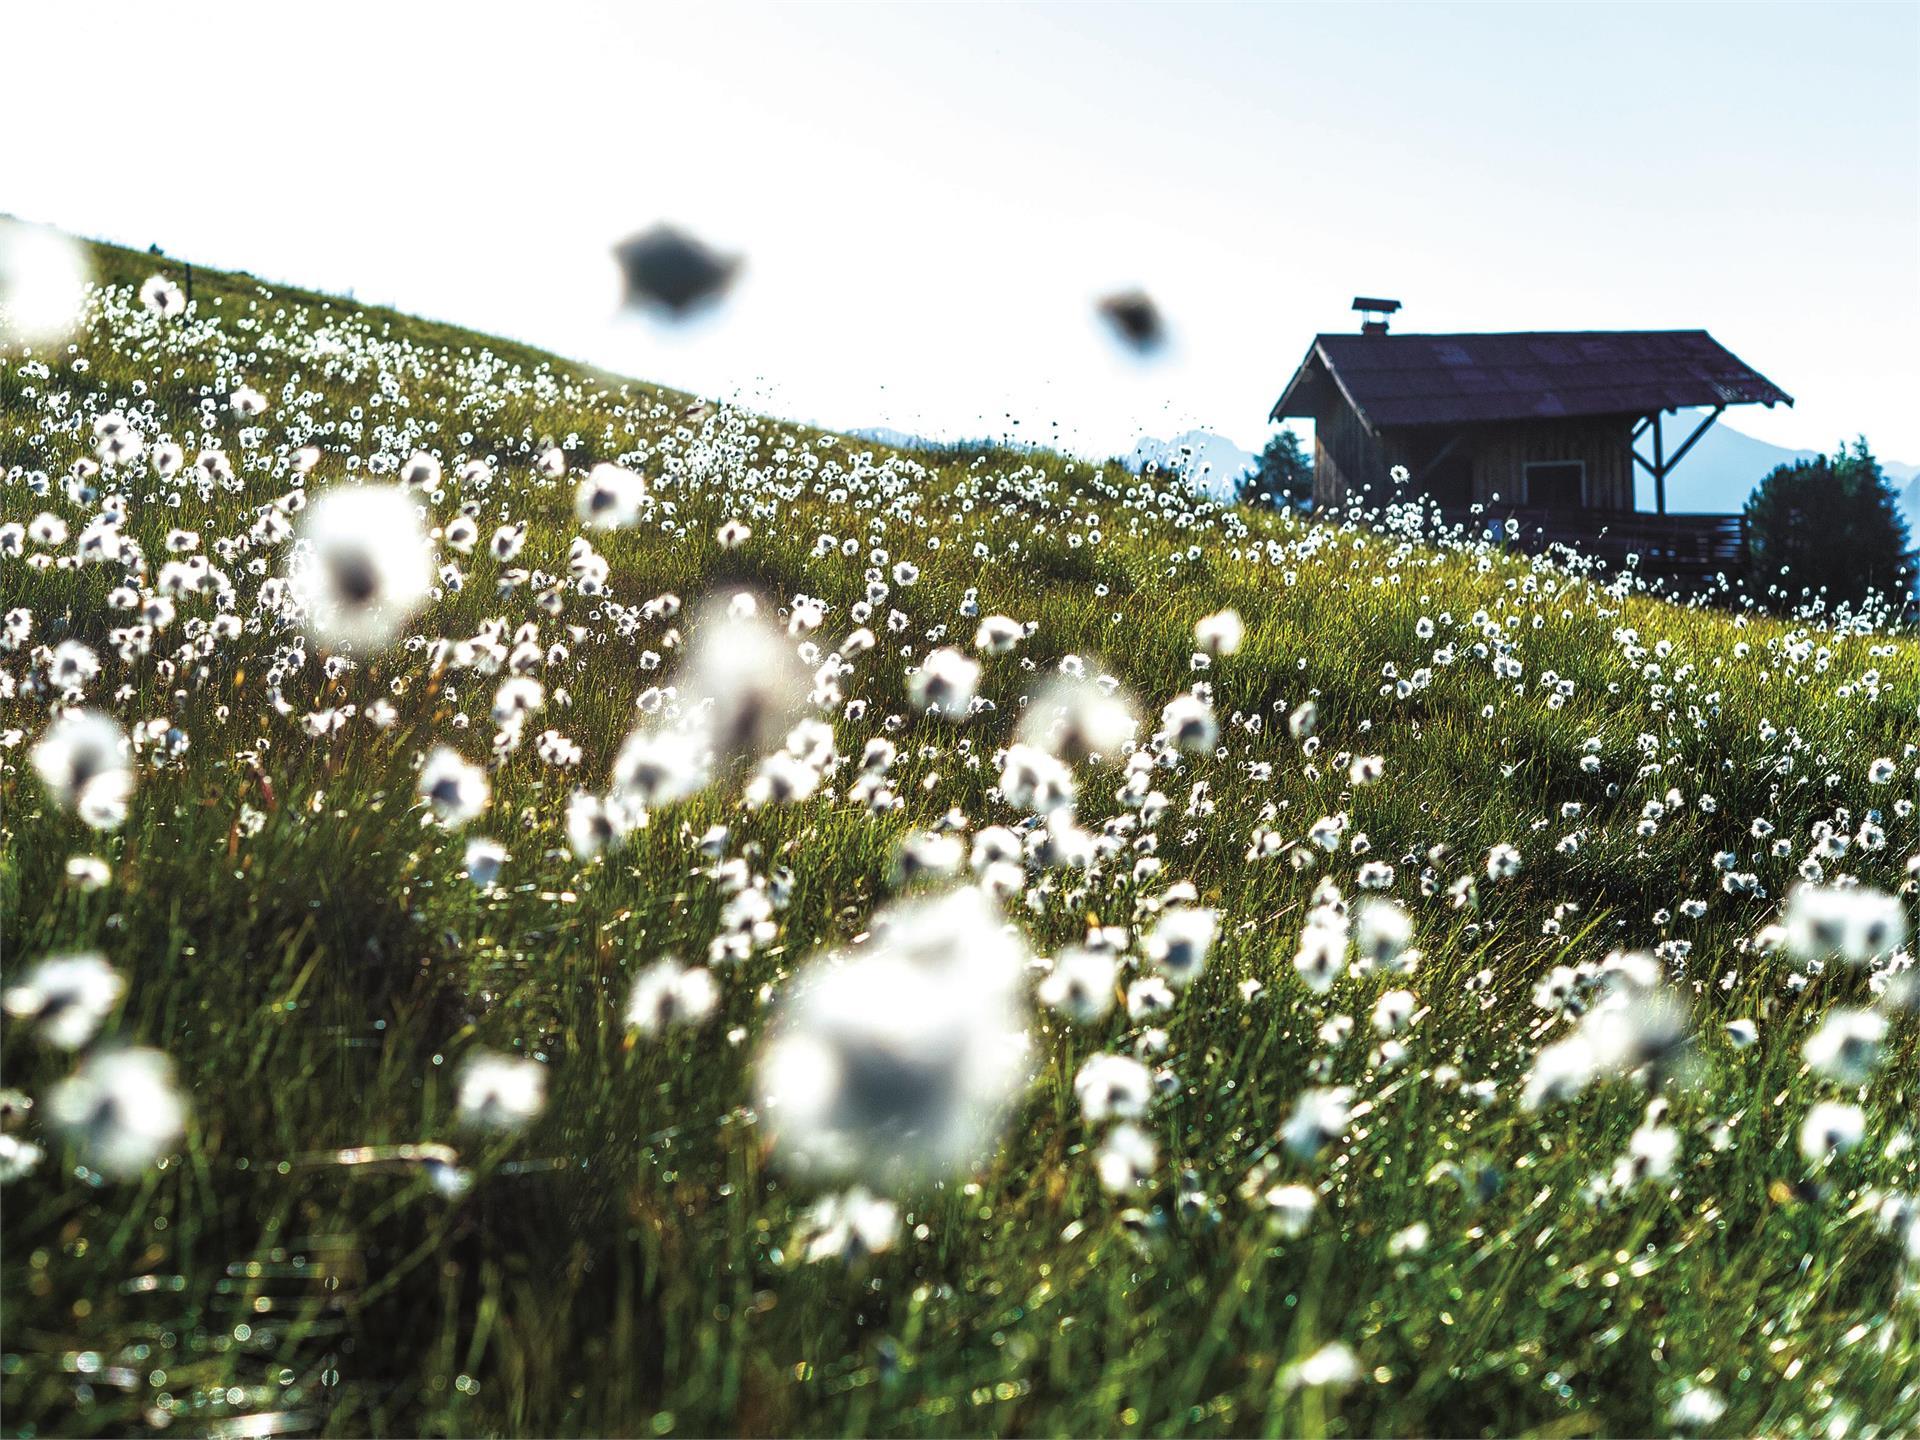 Healthy pleasure from fresh spring herbs